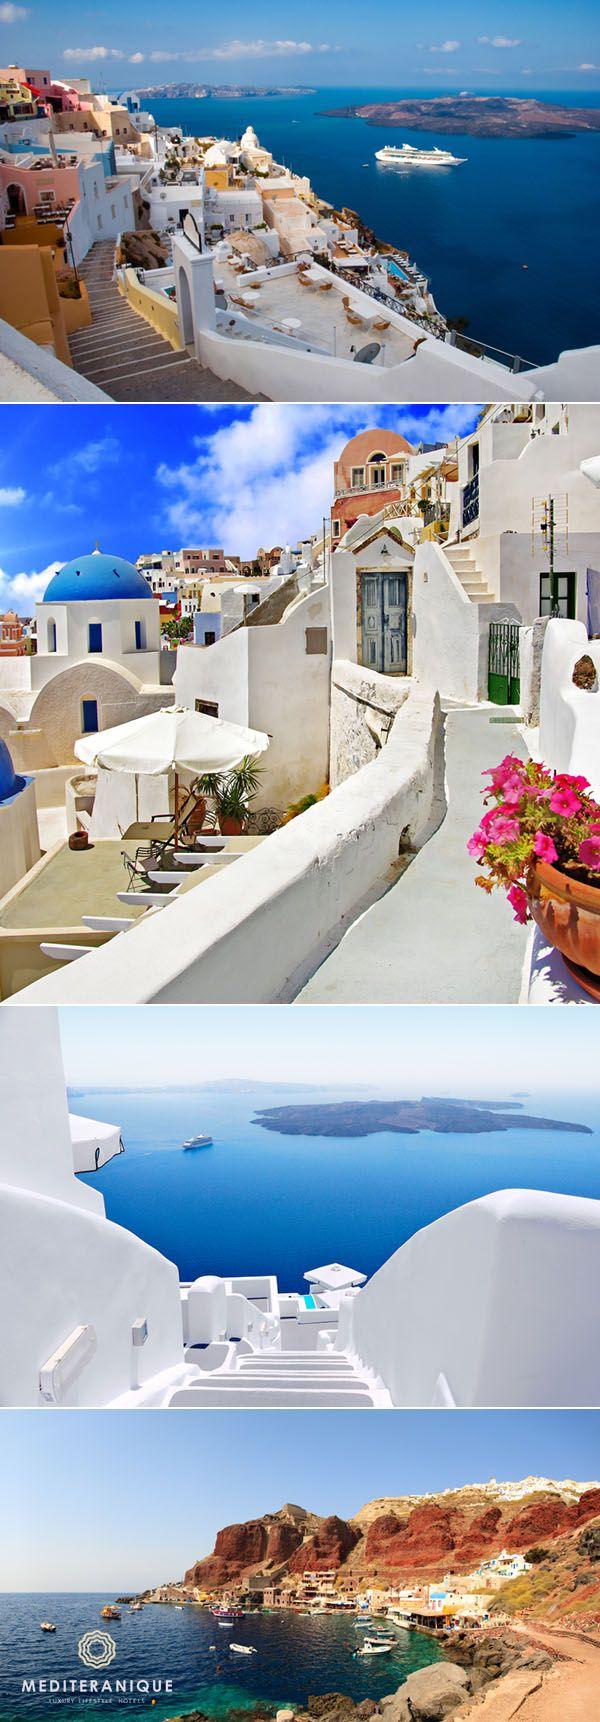 Santorini, Greece. For luxury hotel deals in Santorini book with Mediteranique http://www.mediteranique.com/hotels-greece/santorini/